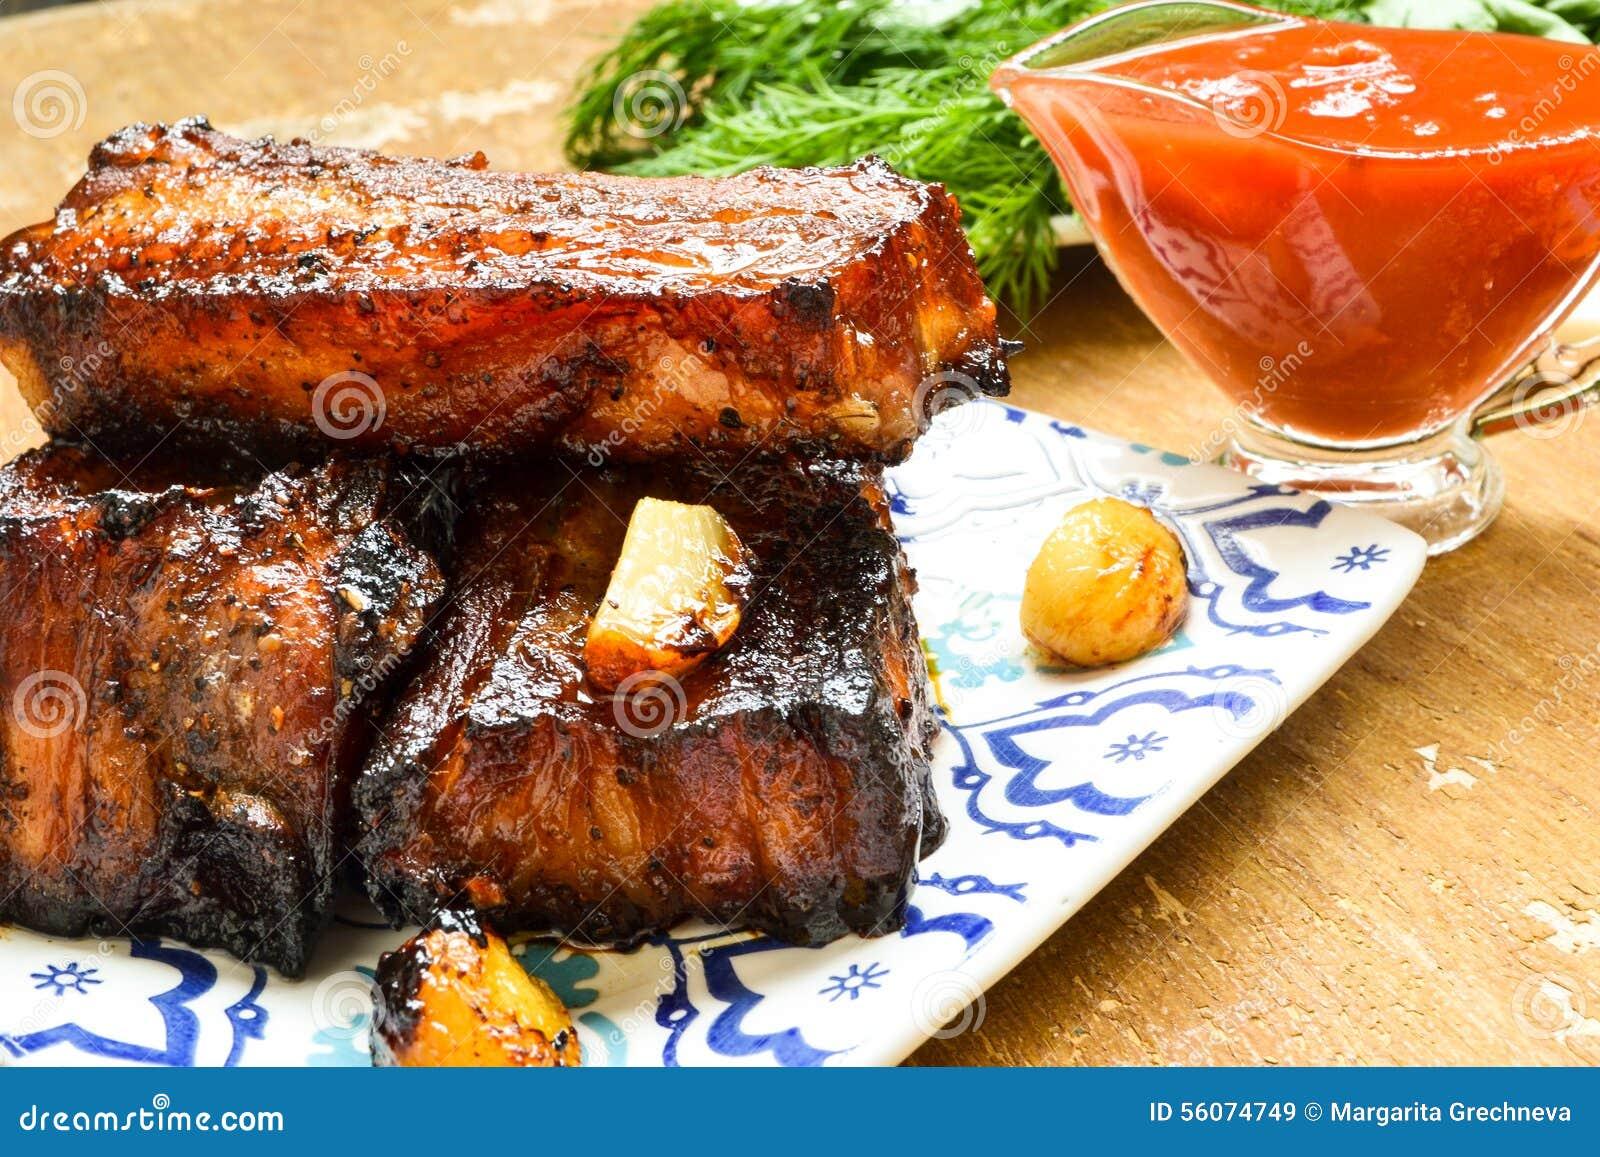 Smoked pork ribs with tomato sauce